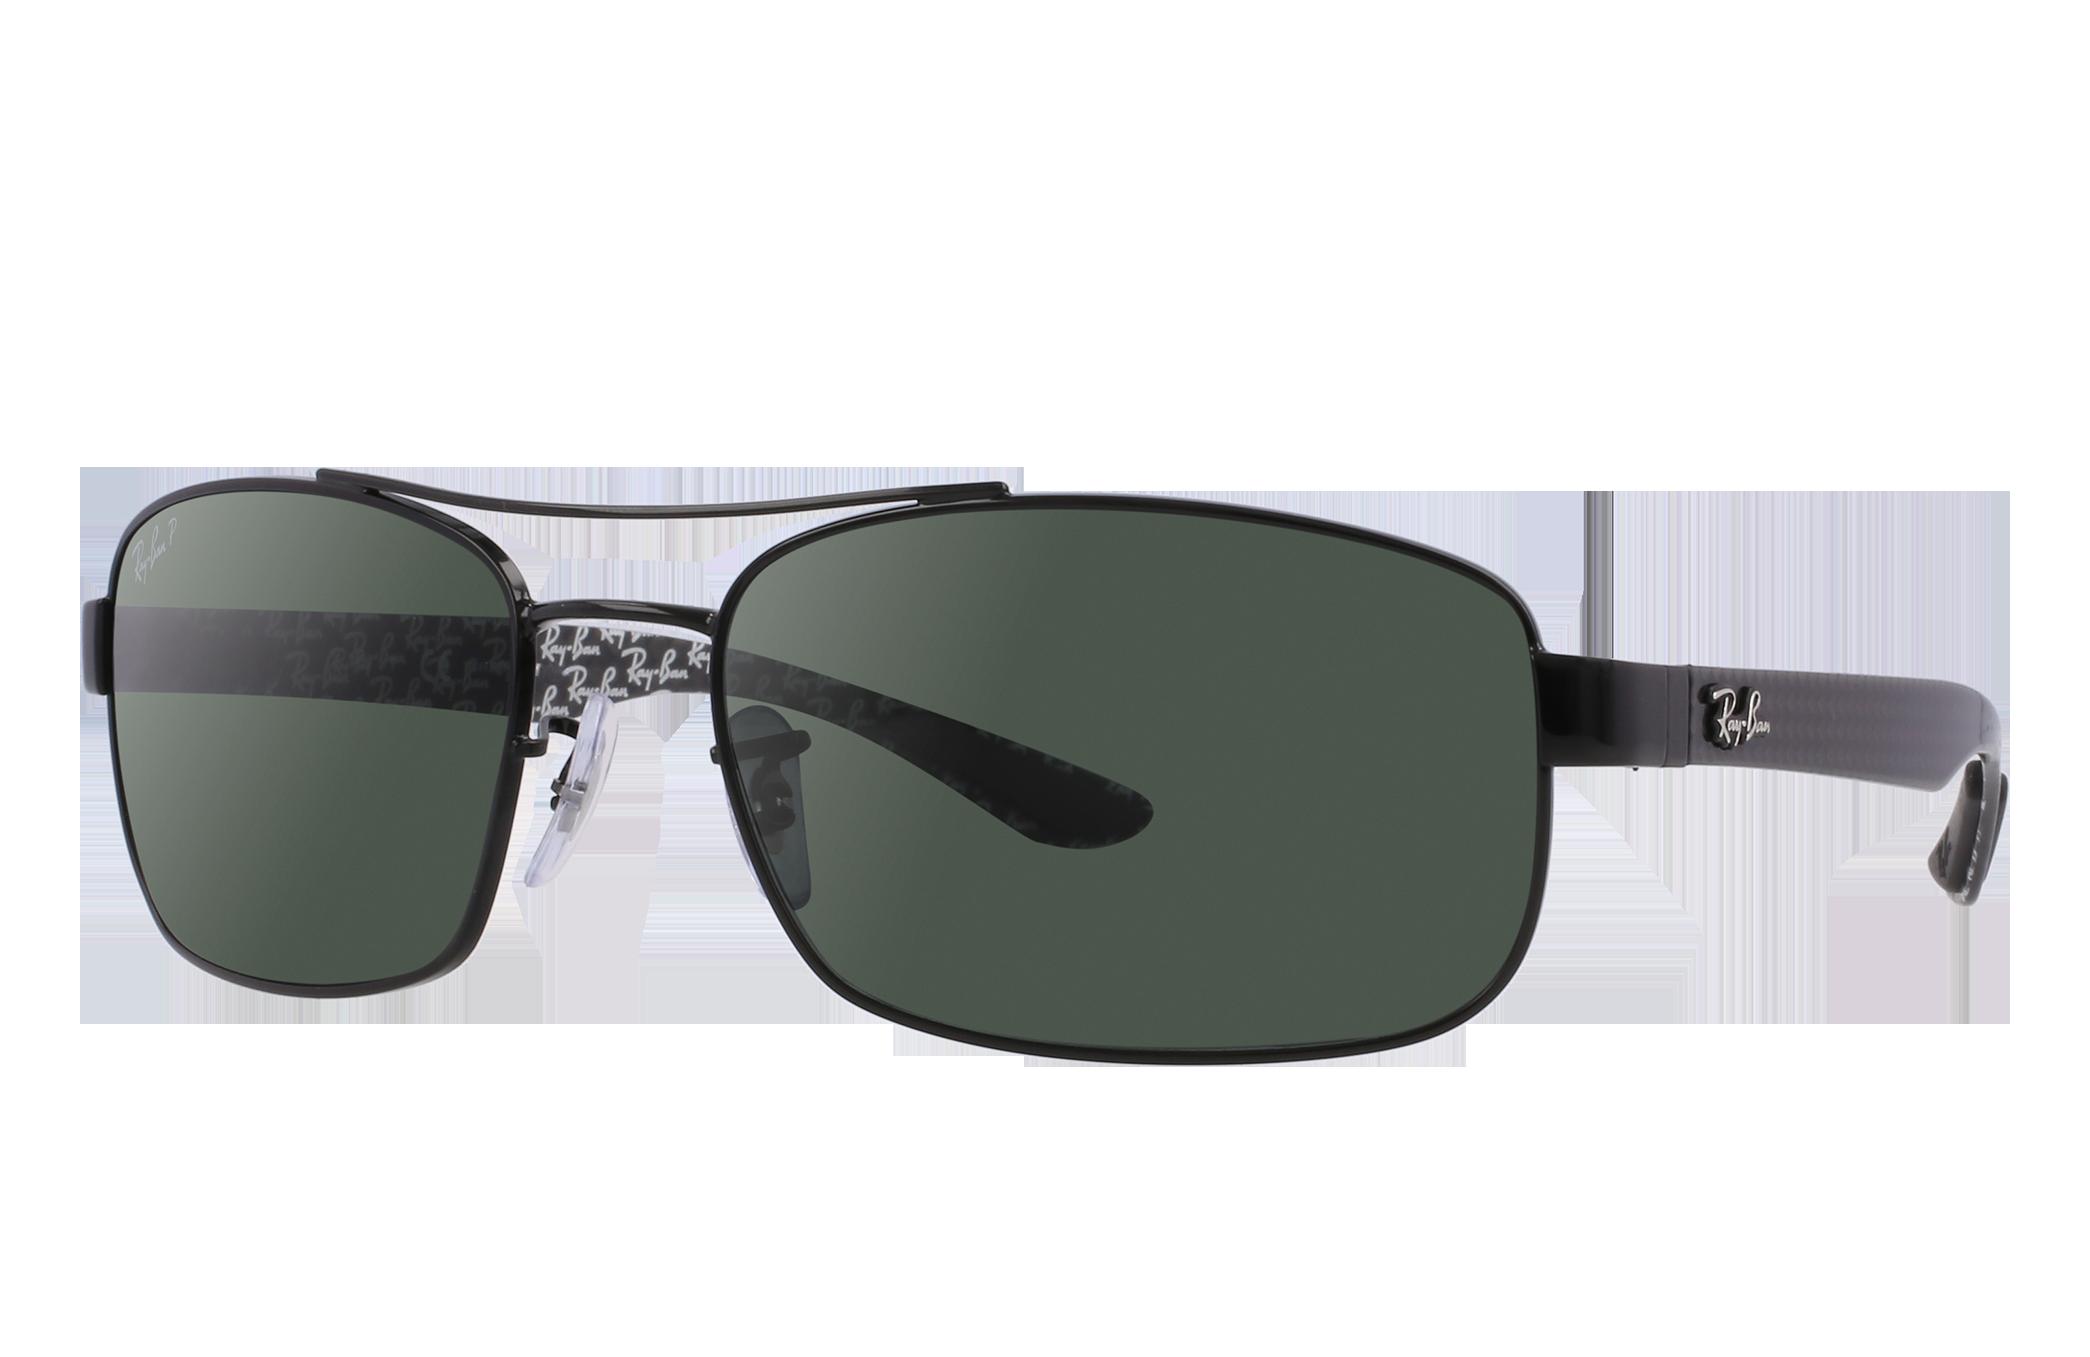 Ray-Ban Rb8316 Black, Polarized Green Lenses - RB8316